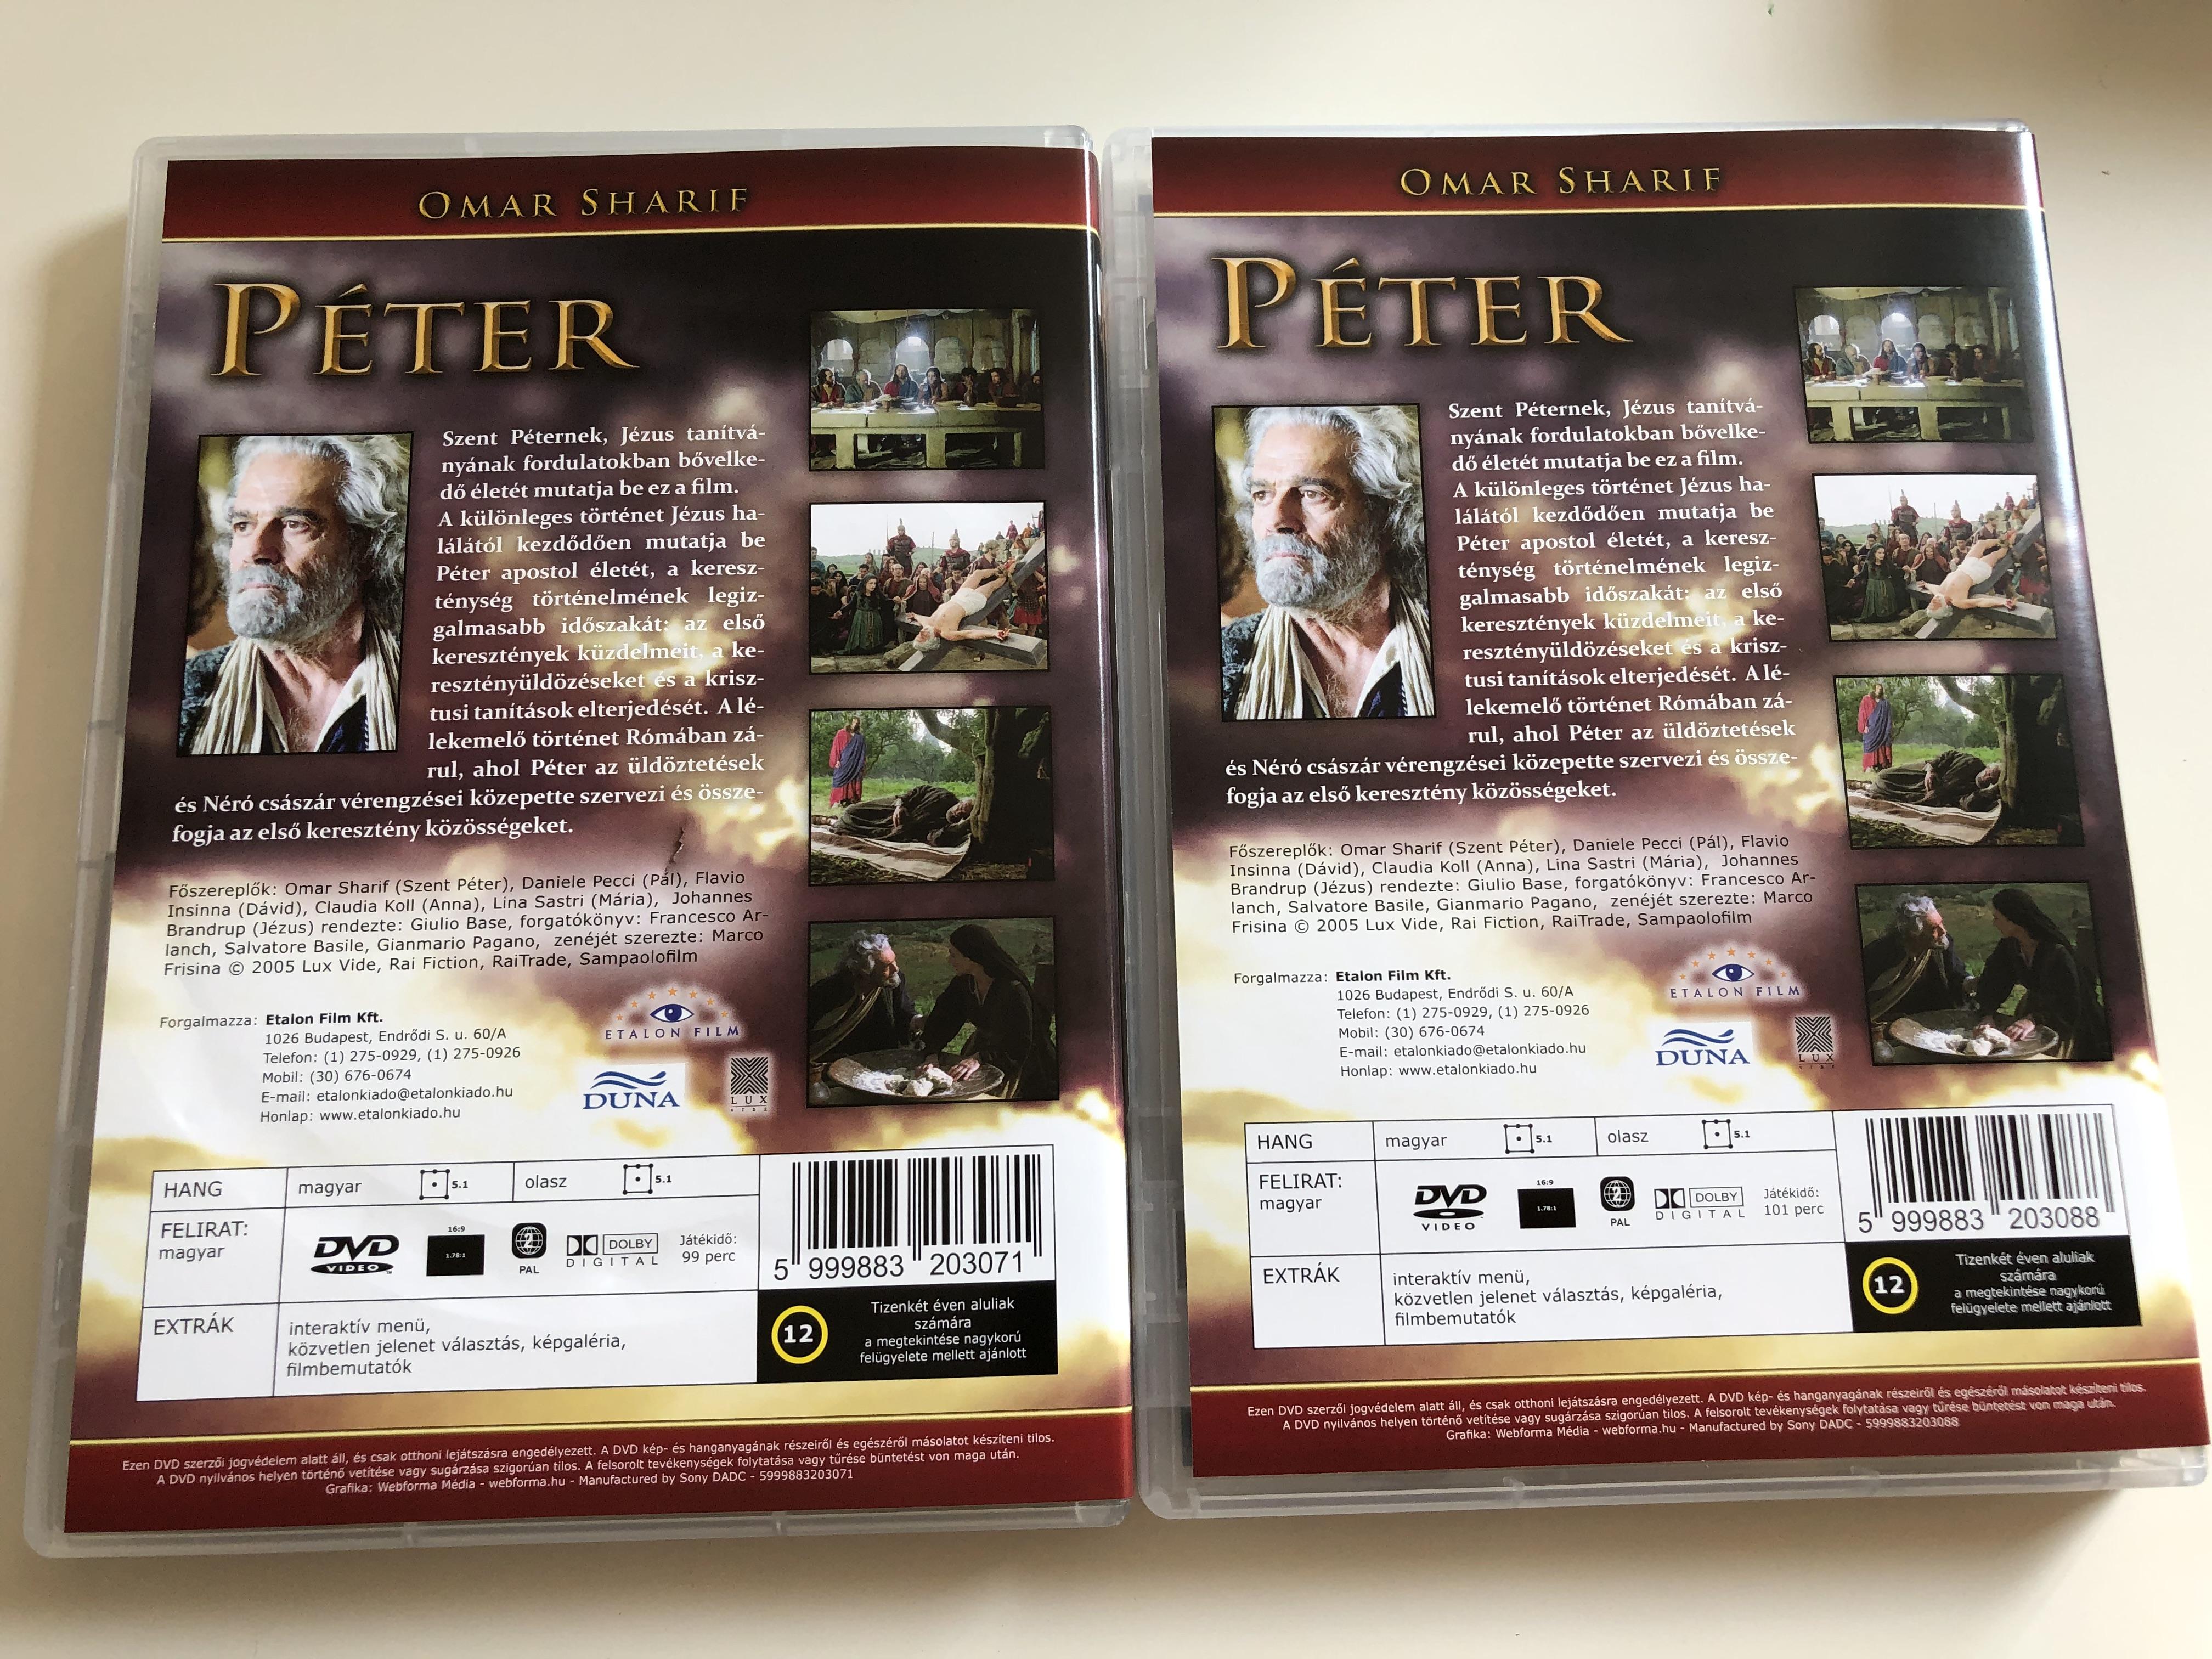 san-pietro-i-ii-dvd-set-2005-p-ter-a-k-szikla-i-ii.-r-sz-directed-by-giulio-base-starring-omar-sharif-daniele-pecci-flavio-insinna-claudia-koll-lina-sastri-johannes-brandrup-imperium-saint-peter-2-.jpg